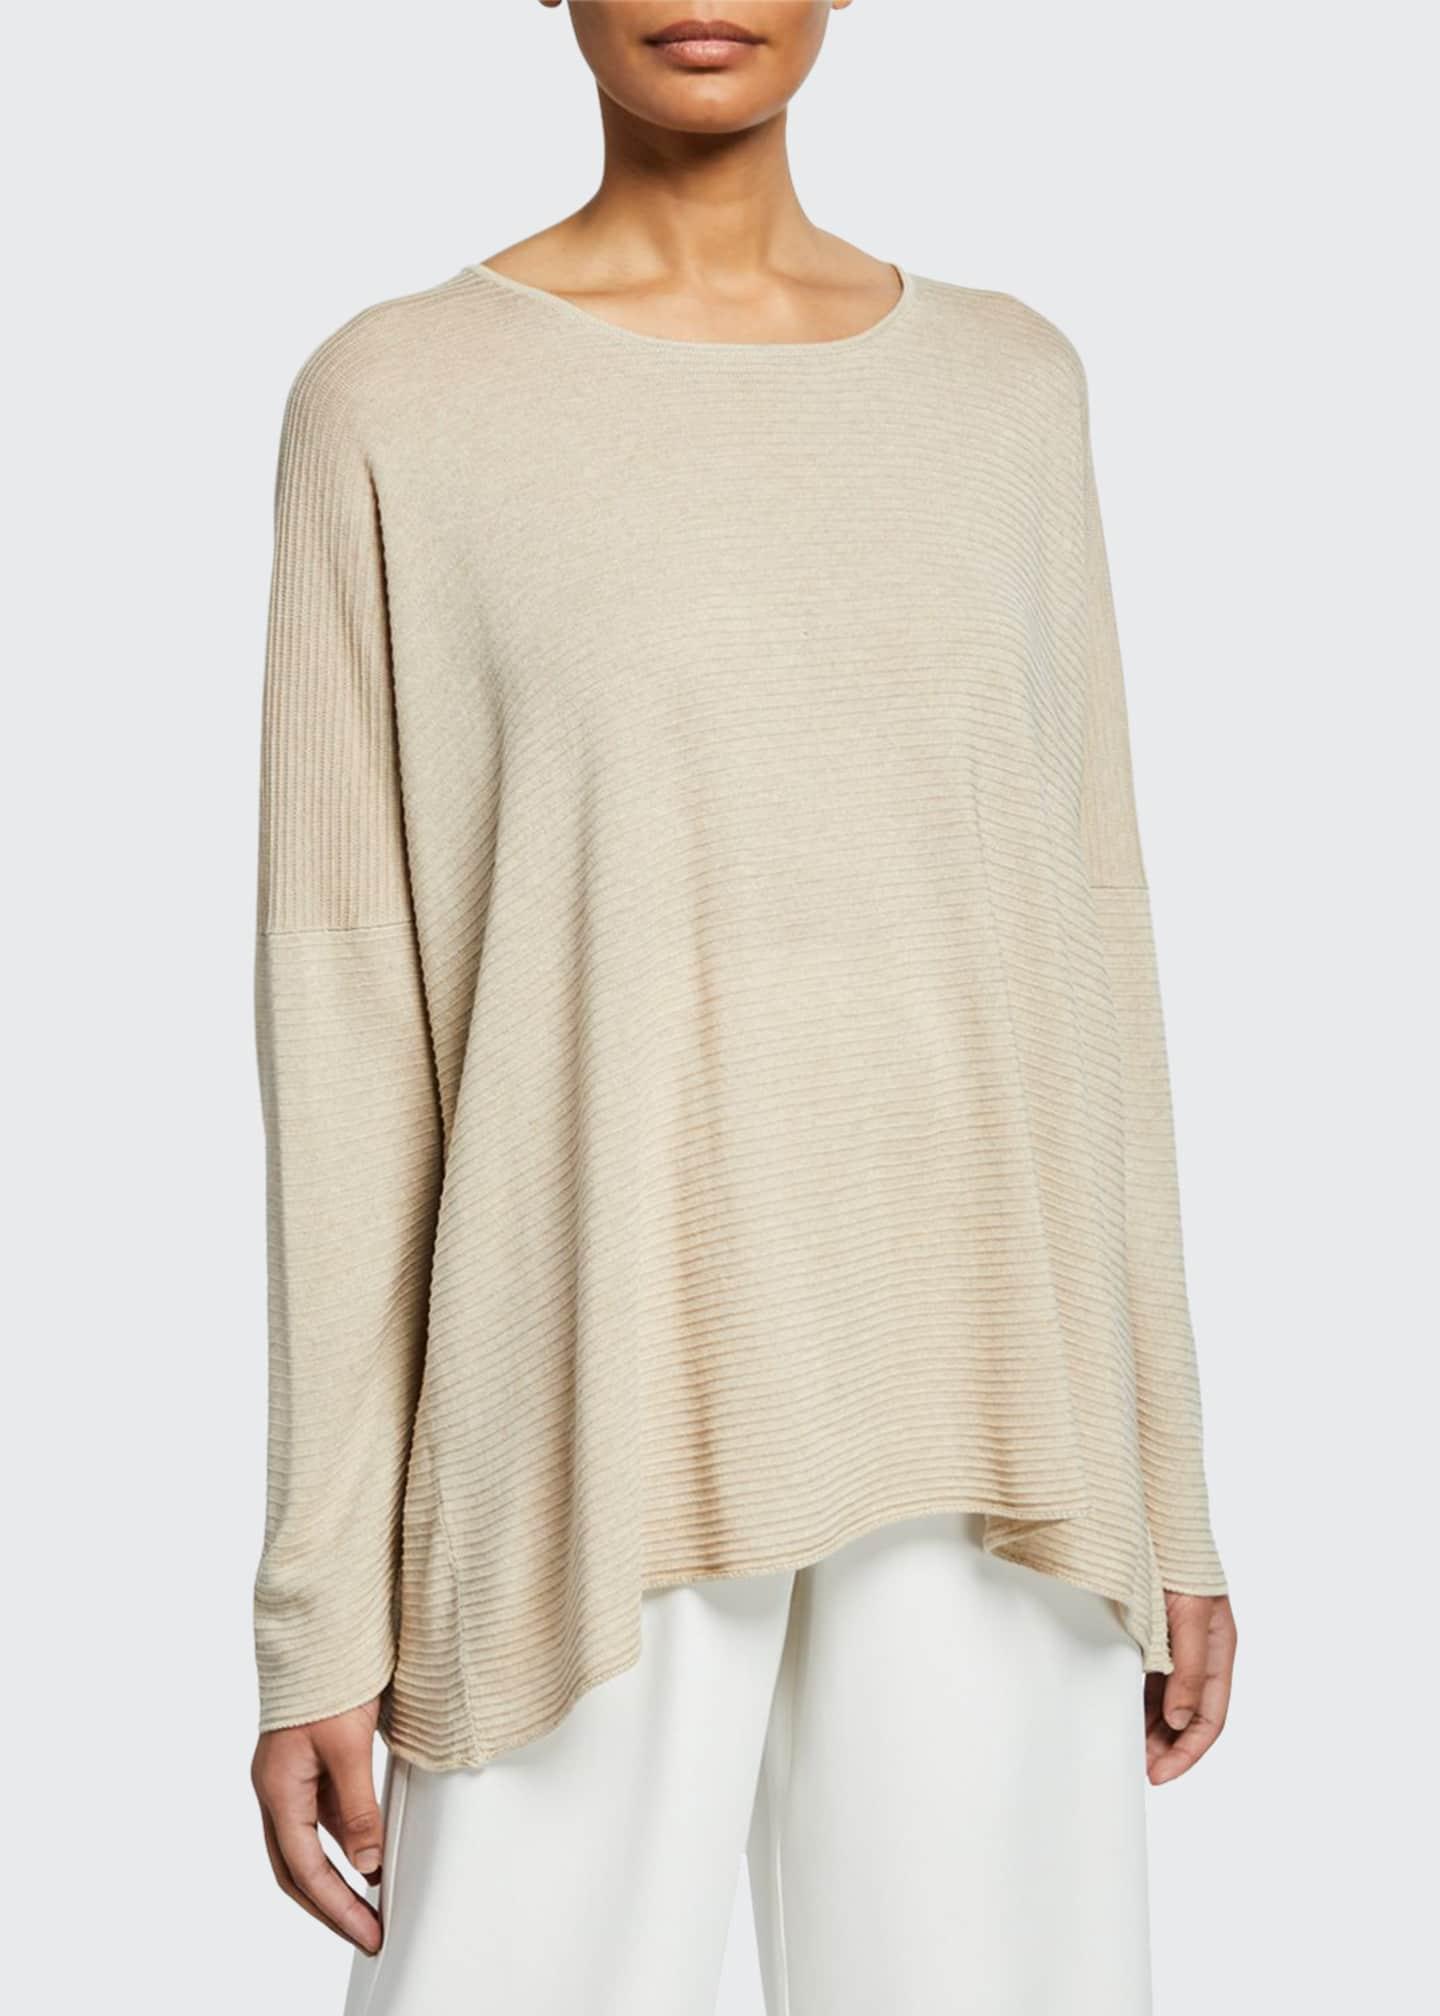 Eskandar Ultra Lightweight Raw Edge Silk Sweater